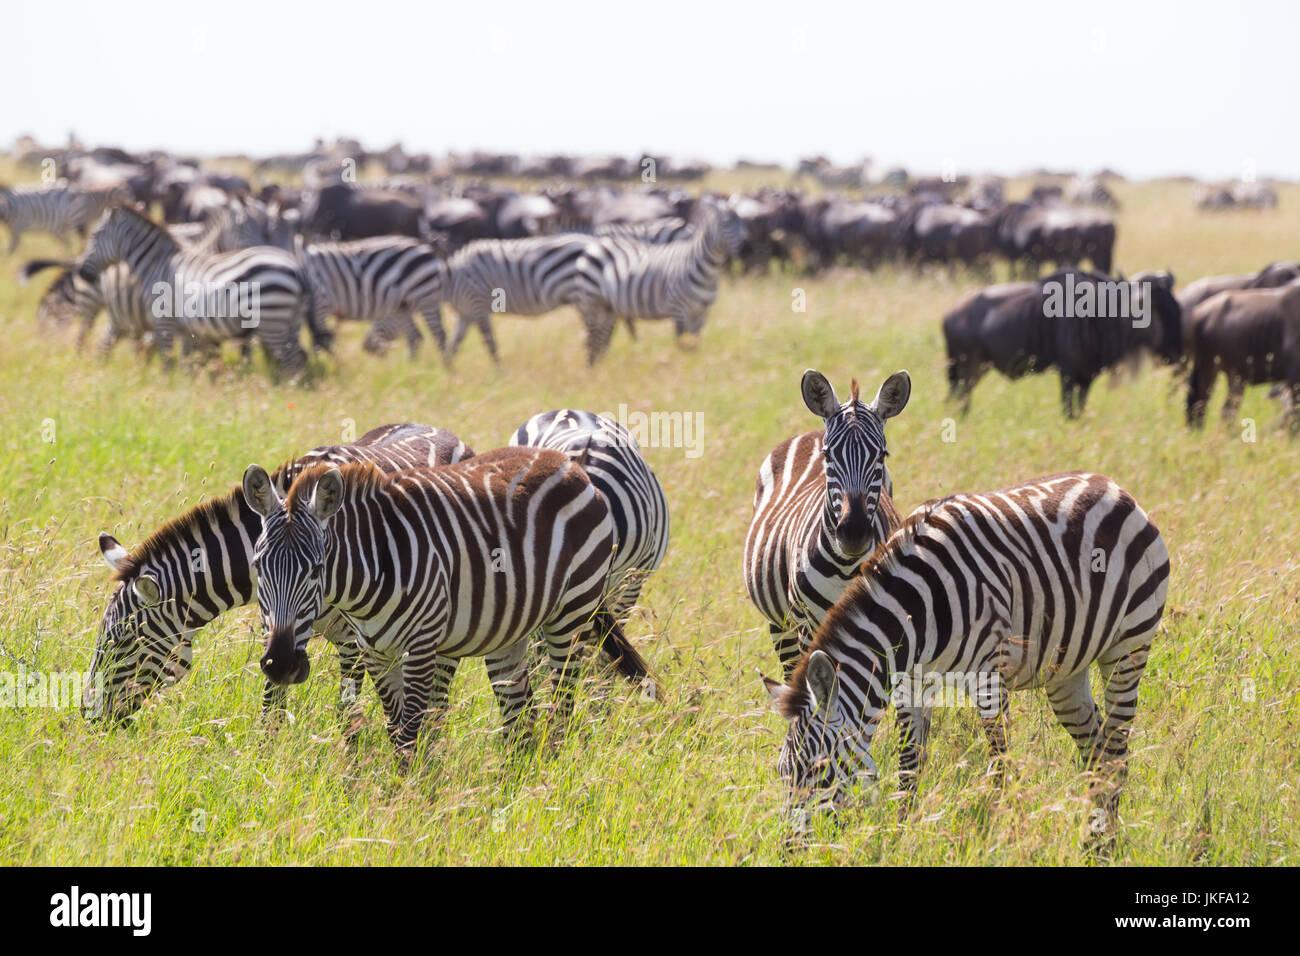 Zebras grazing in Serengeti National Park in Tanzania, East Africa. Stock Photo